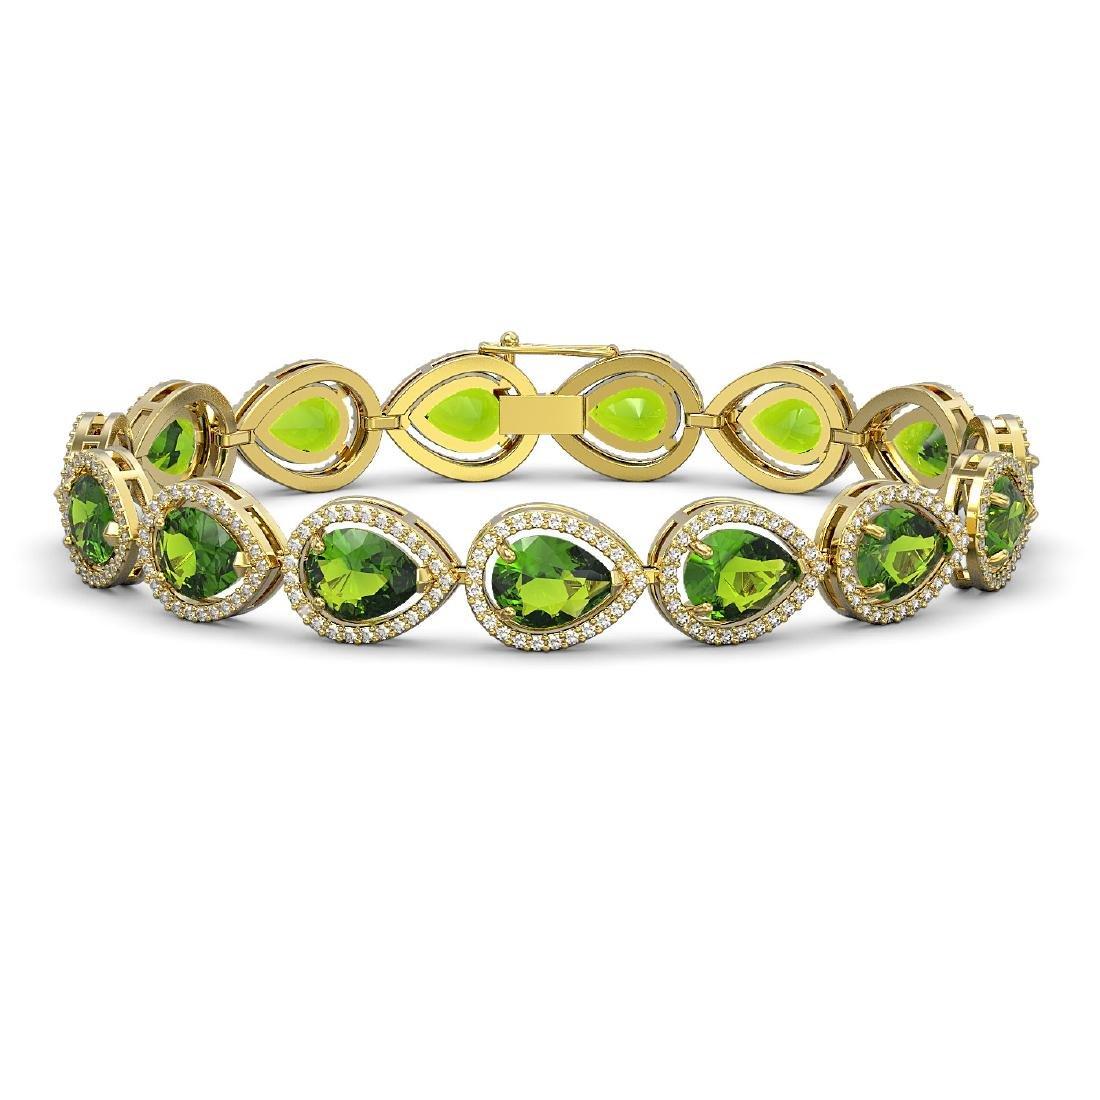 15.8 CTW Peridot & Diamond Halo Bracelet 10K Yellow